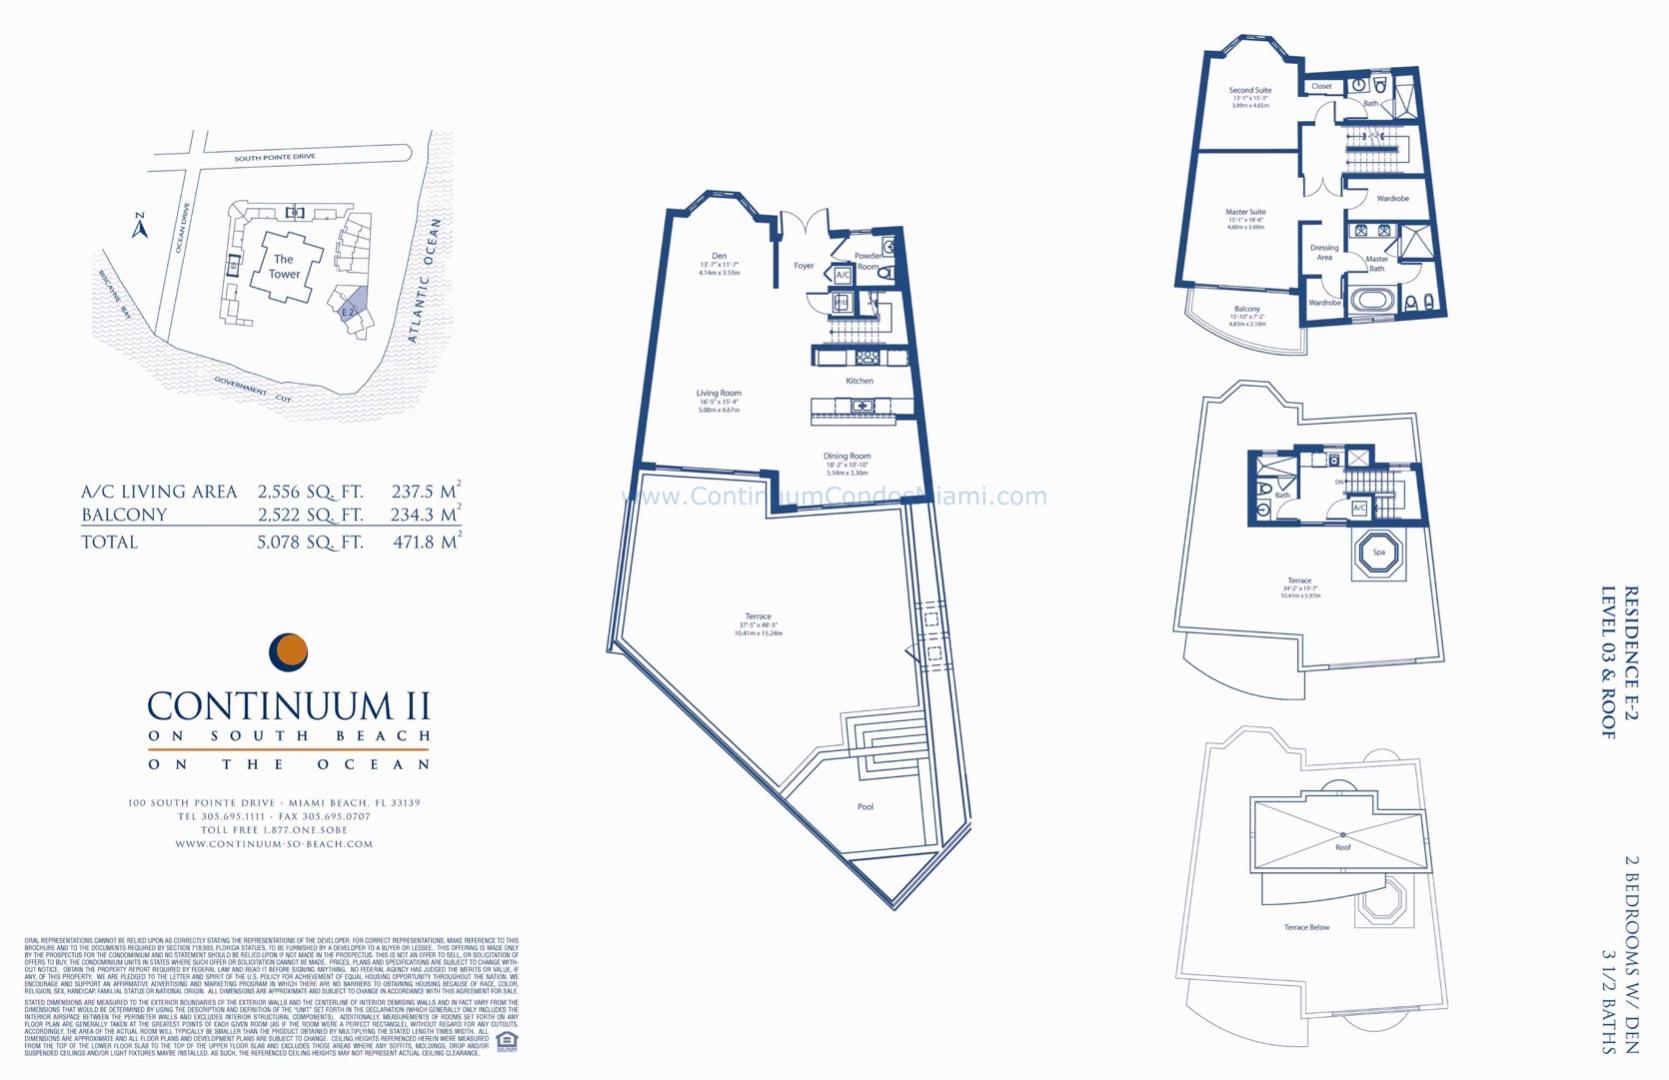 Floor plan image TH2 - 2/3/1  - 5078 sqft image